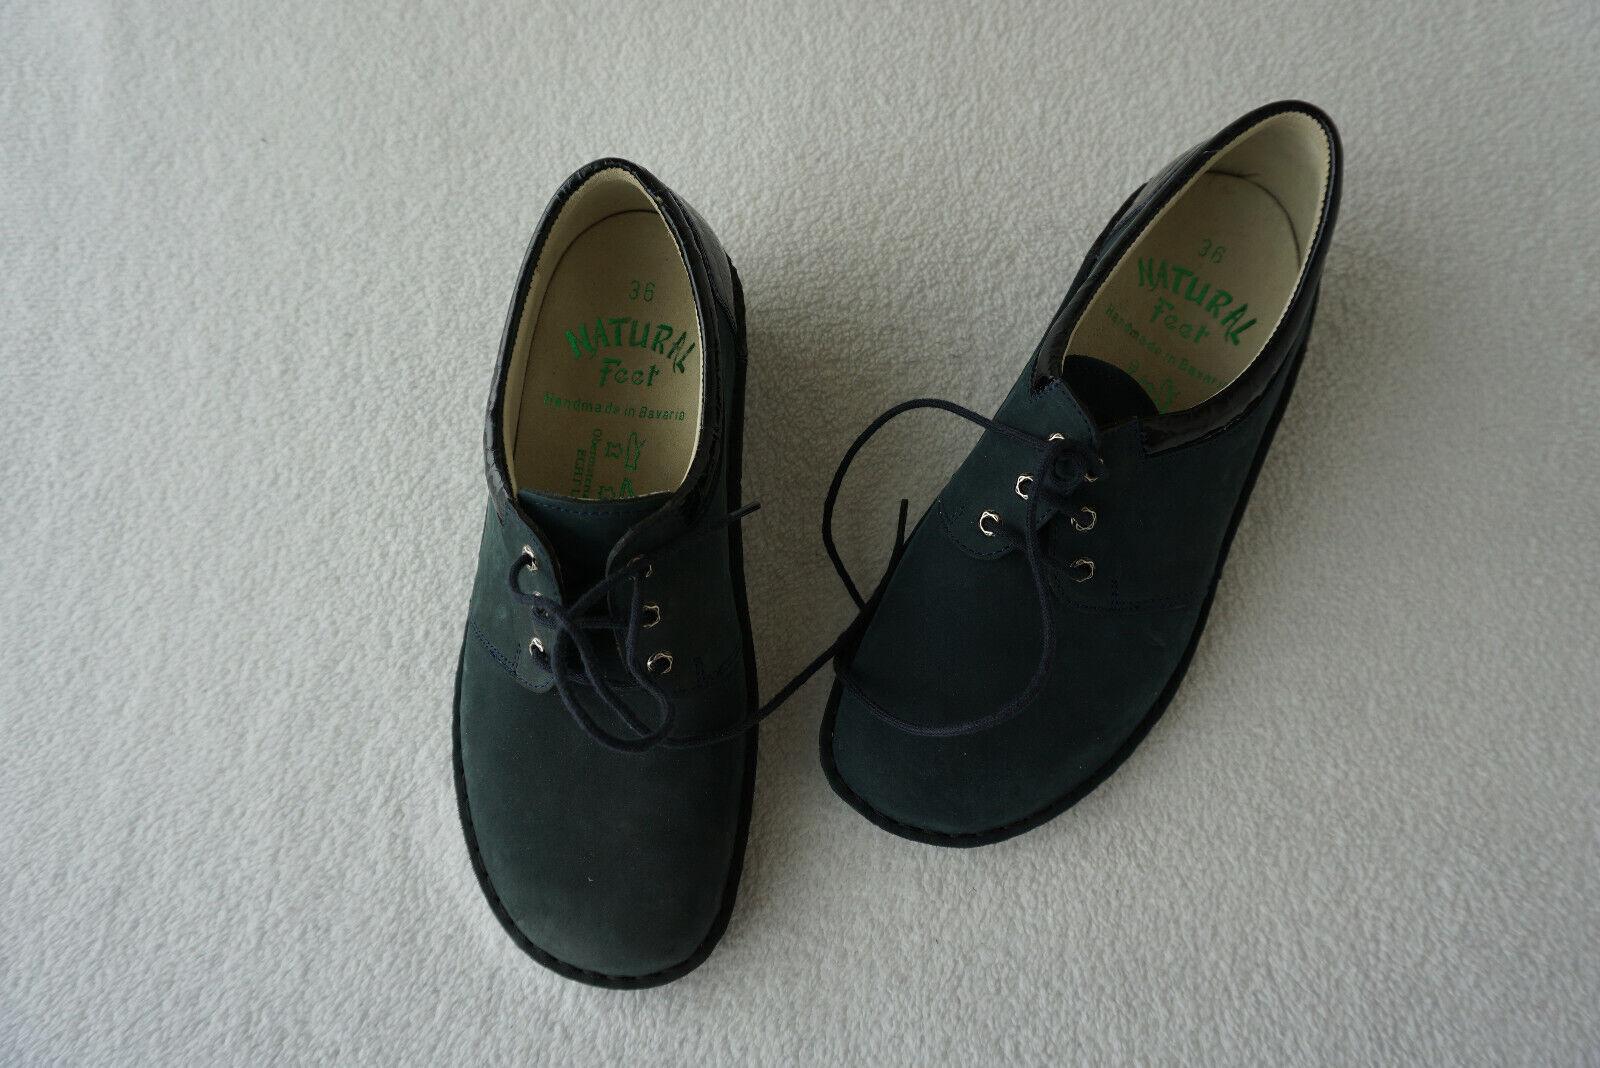 orthopädische Natural Feet Damen Schuhe Schnürschuh marine Gr.36 Nubuk Leder NEU